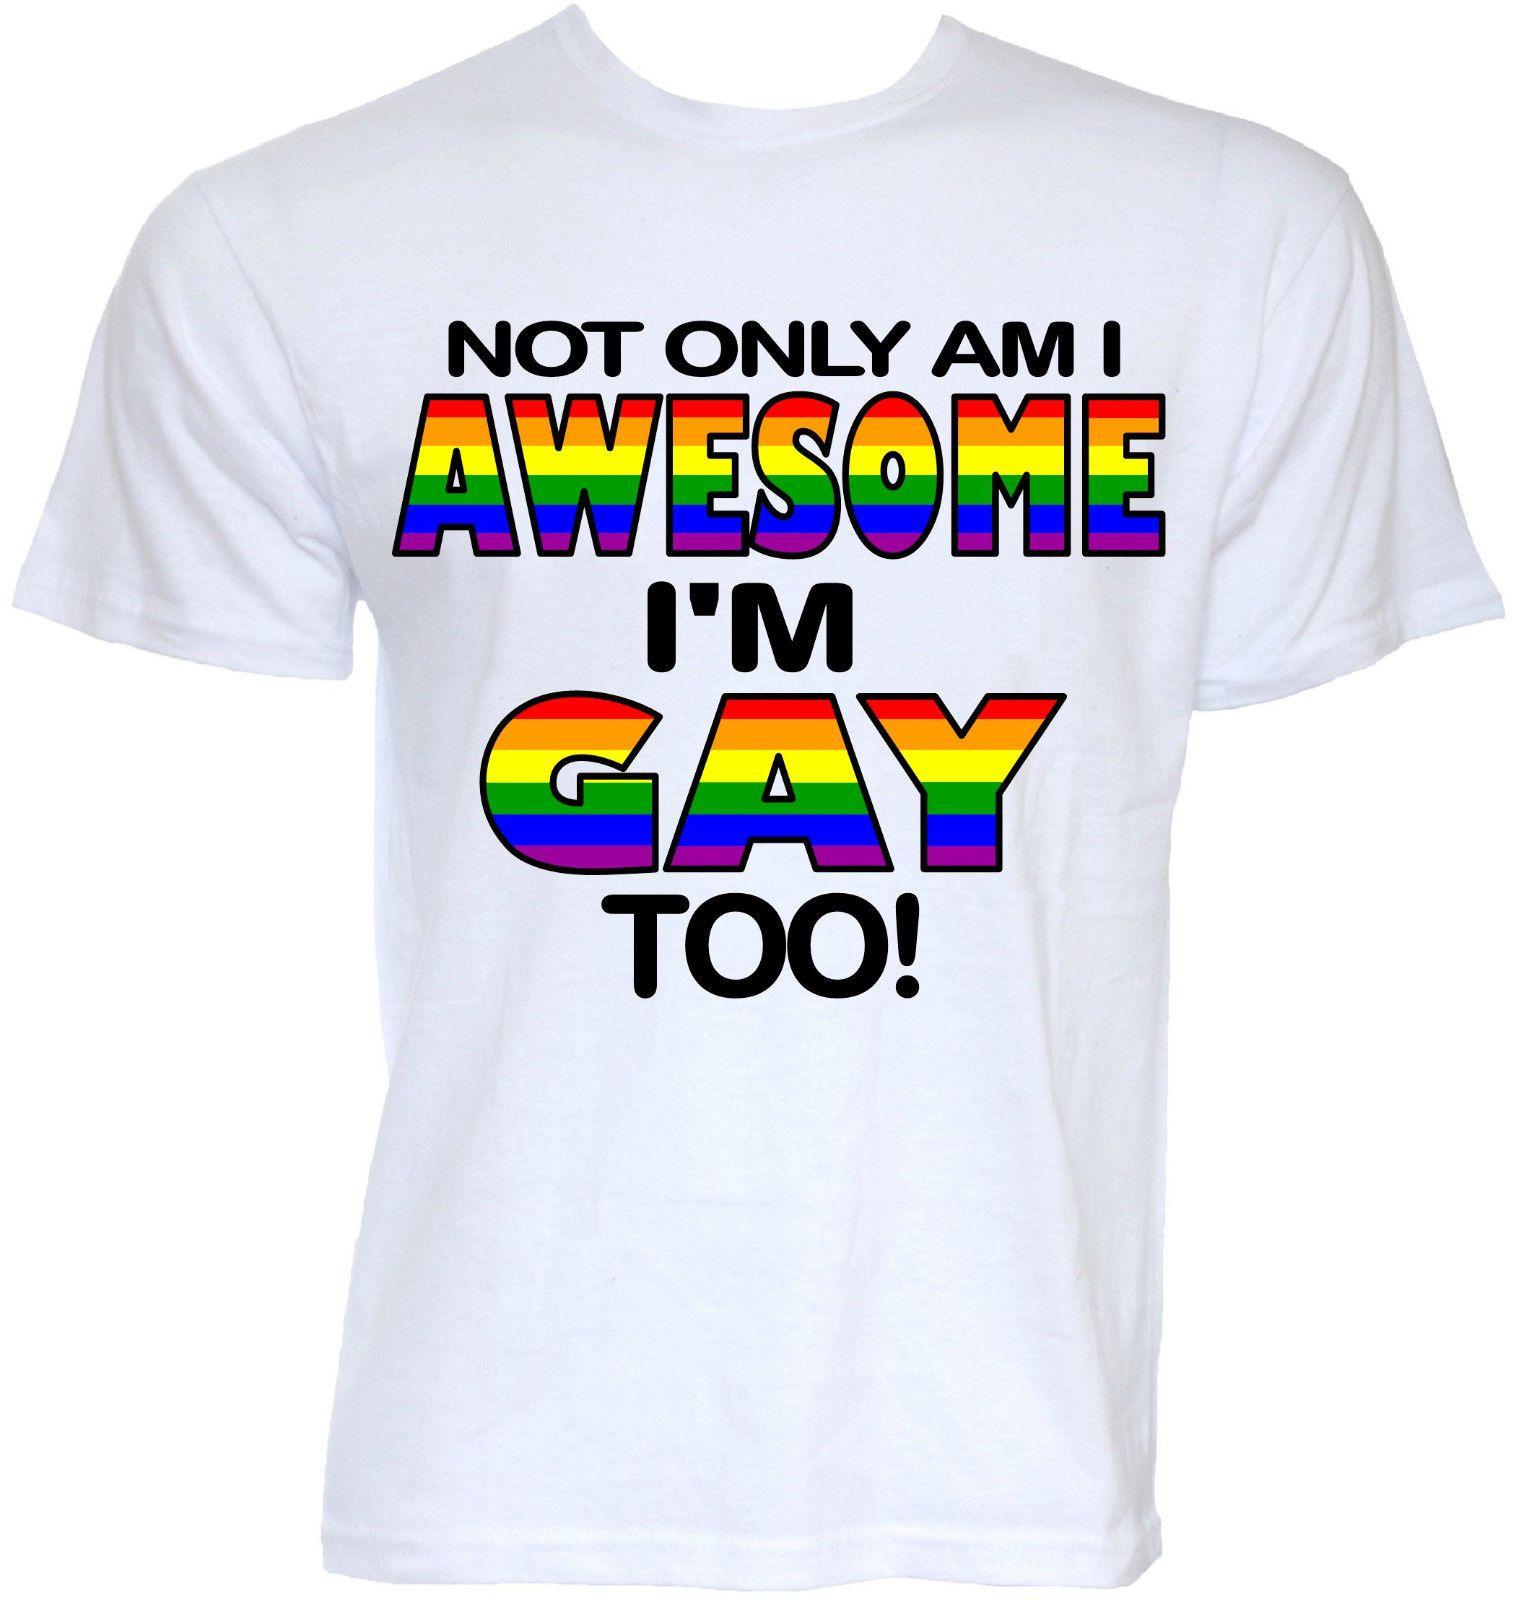 Mens Womens Funny Cool Novelty Joke Gay Pride Slogan Flag T Shirts Lgbt  Gifts Men T Shirt Cheap Sale 100 % Cotton Ts Shirts A Team Shirts From  Zoyystore 7b895d7a71